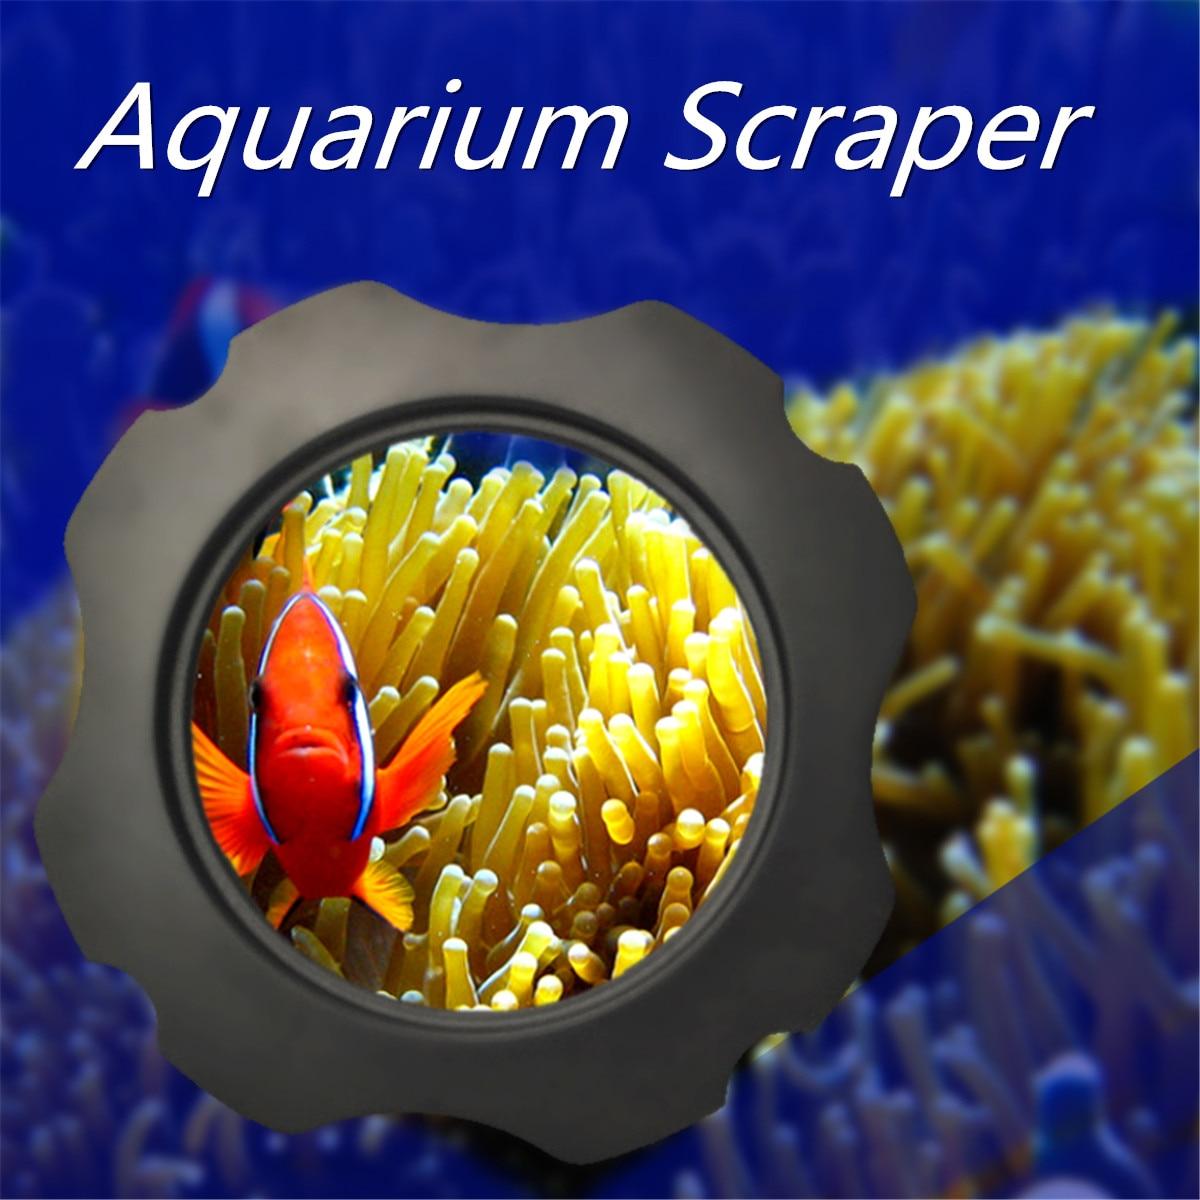 2 in 1 Aquarium Magnifier Magnetic Glass Cleaner Fish Tank Scraper ABS Durable Aquarium Scraper With Magnifying Glass Up to 15mm